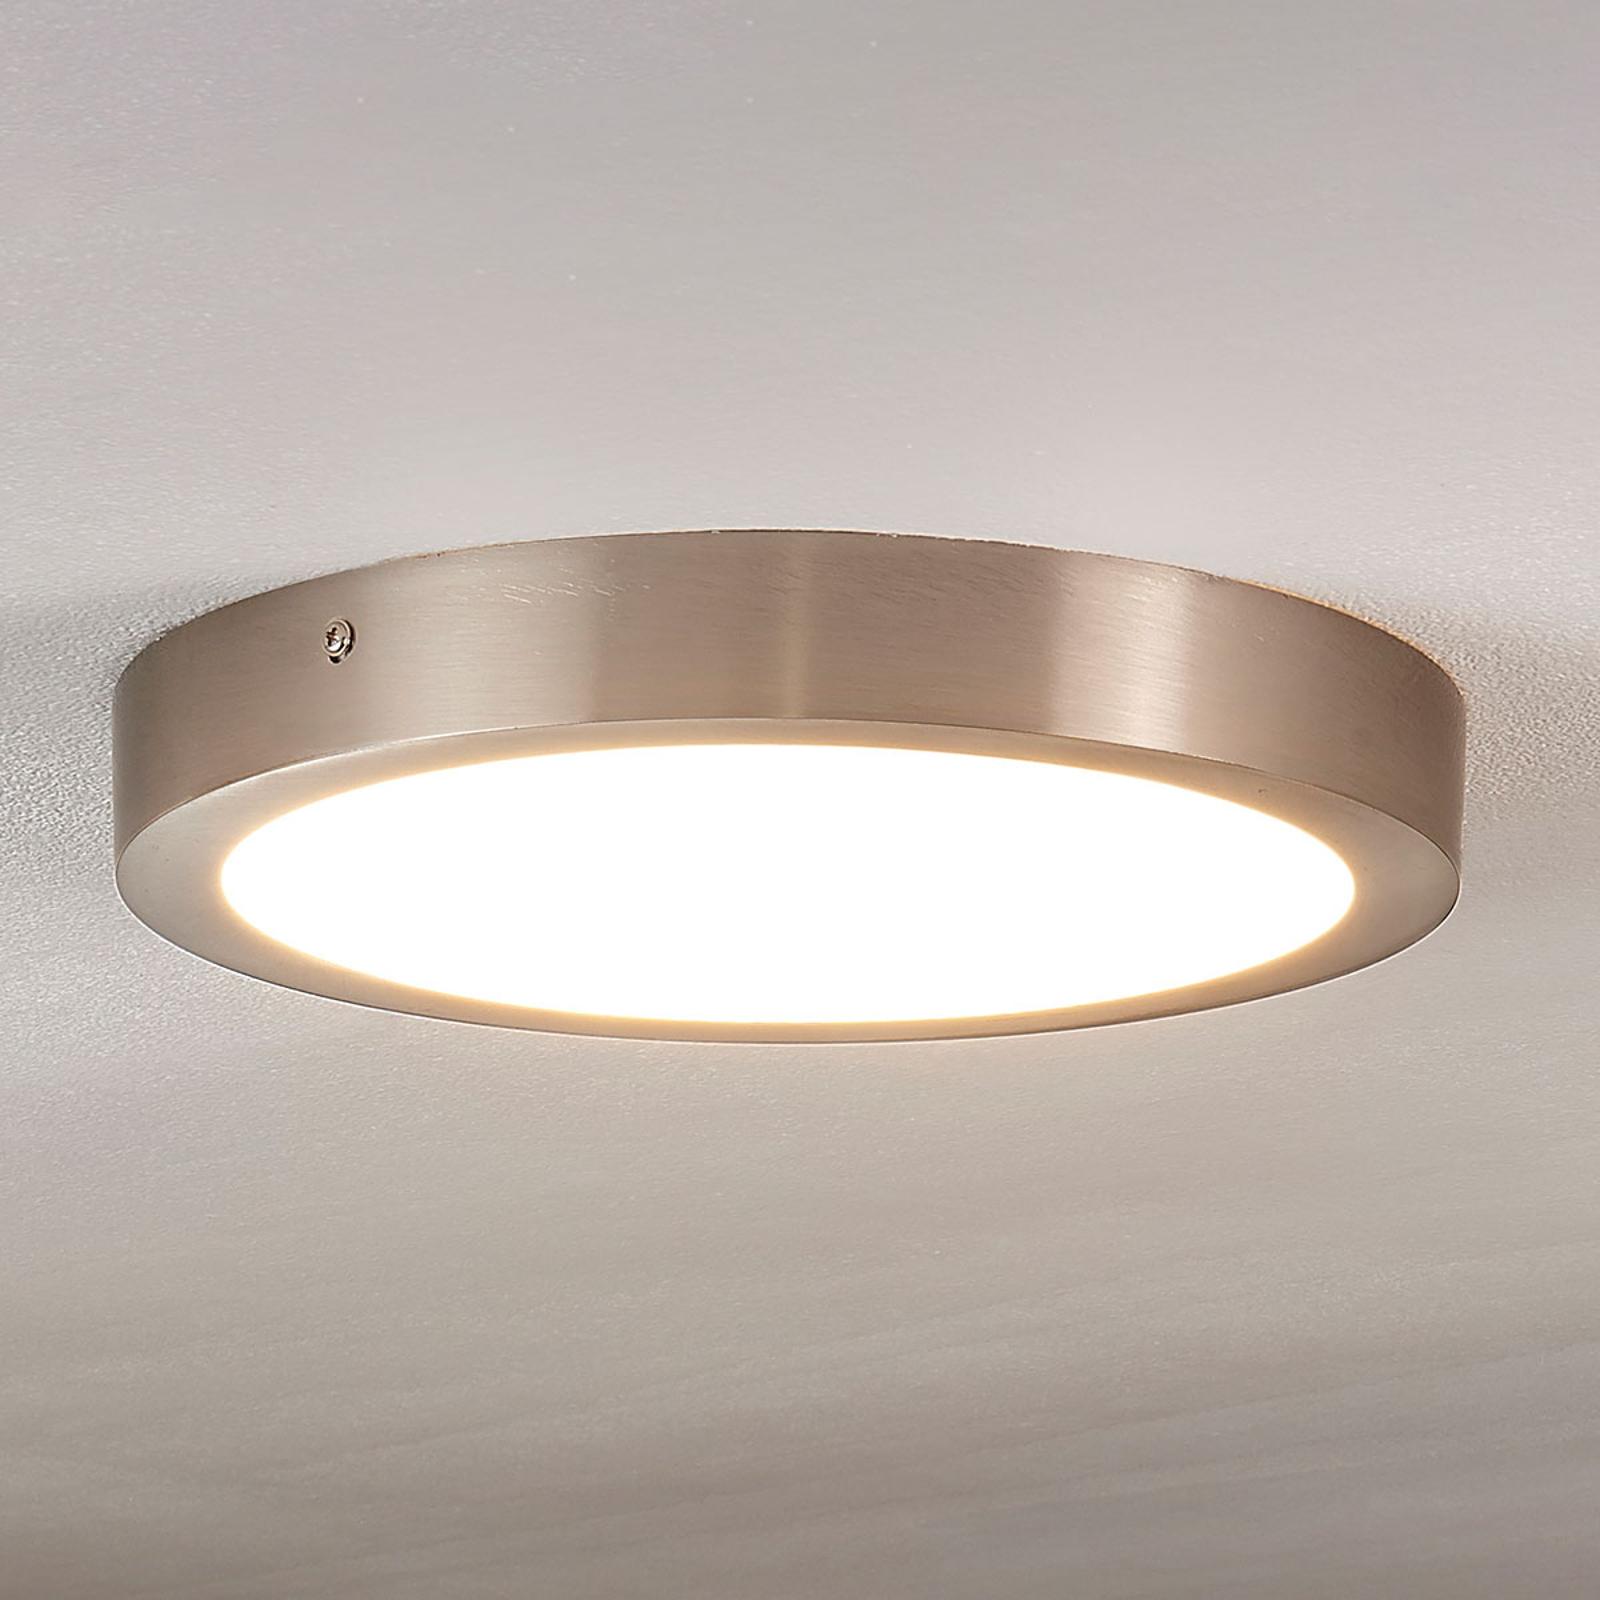 Milea - okrągła lampa sufitowa LED